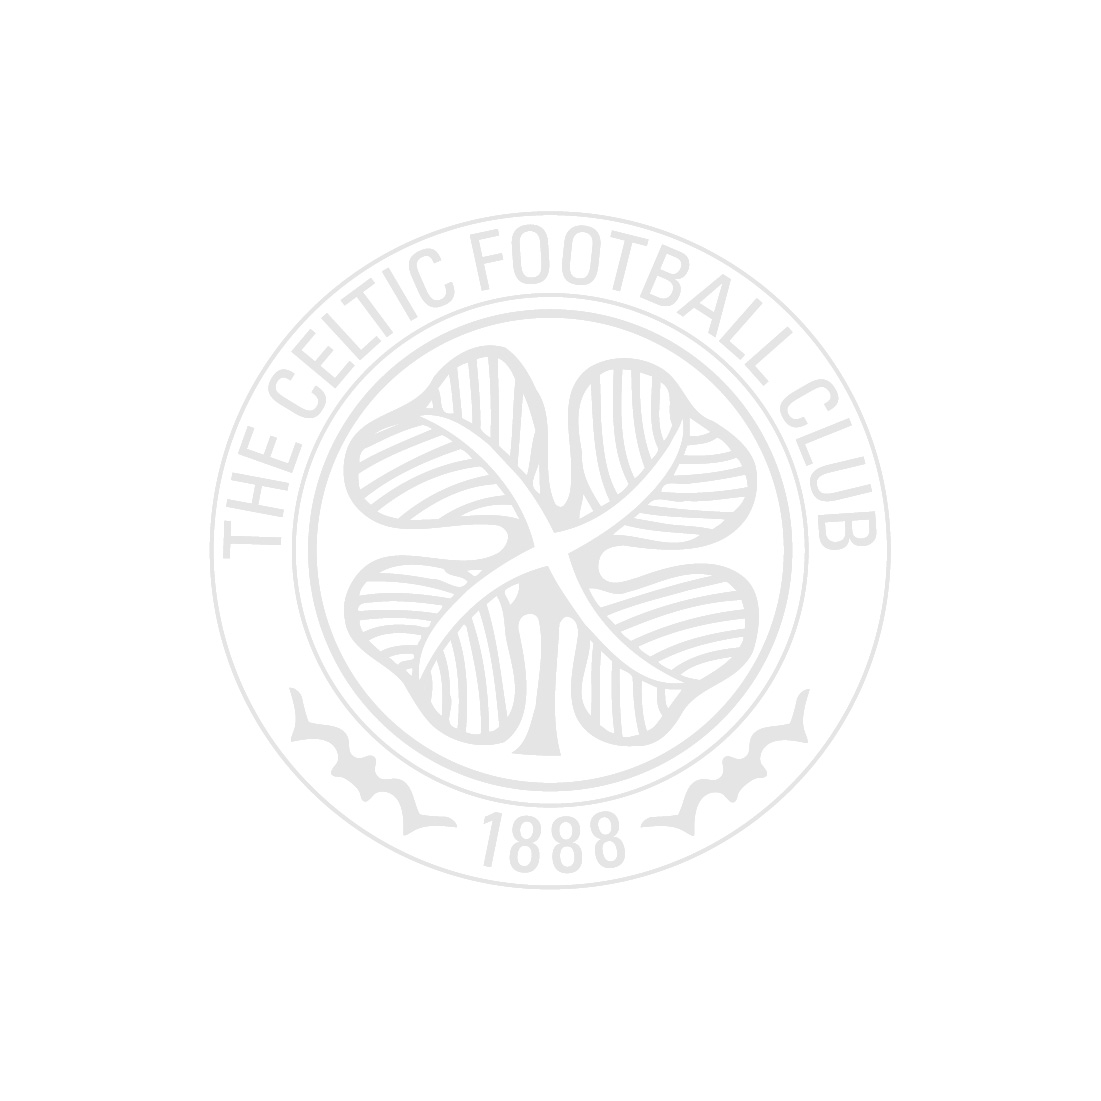 Celtic Antique Silver Plated Crest Badge